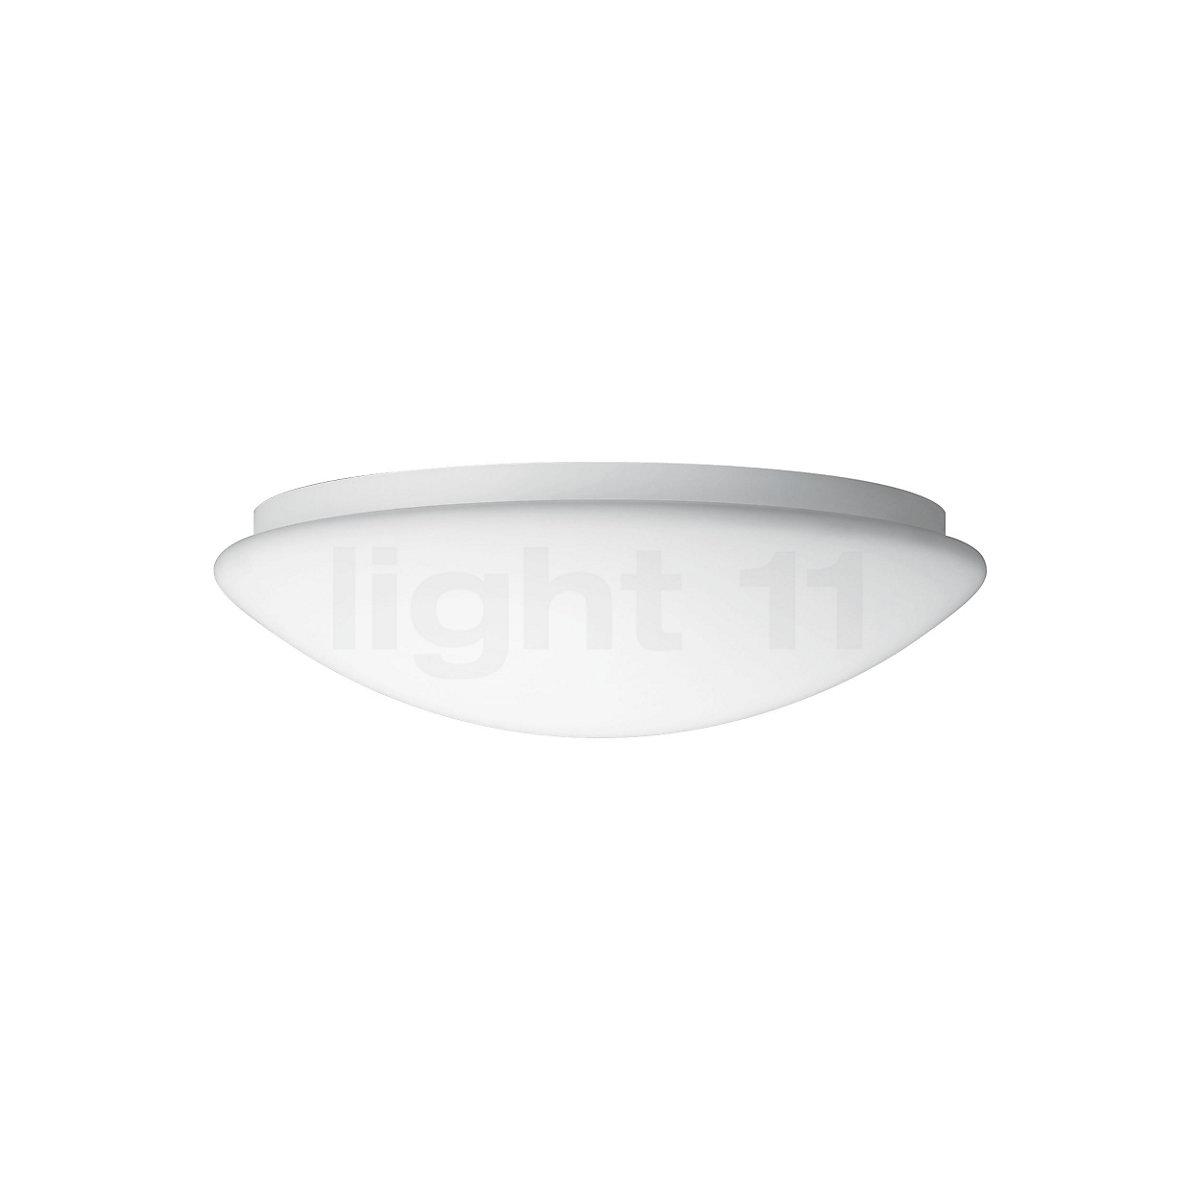 Bega Prima 12138 Decken Wandleuchte LED